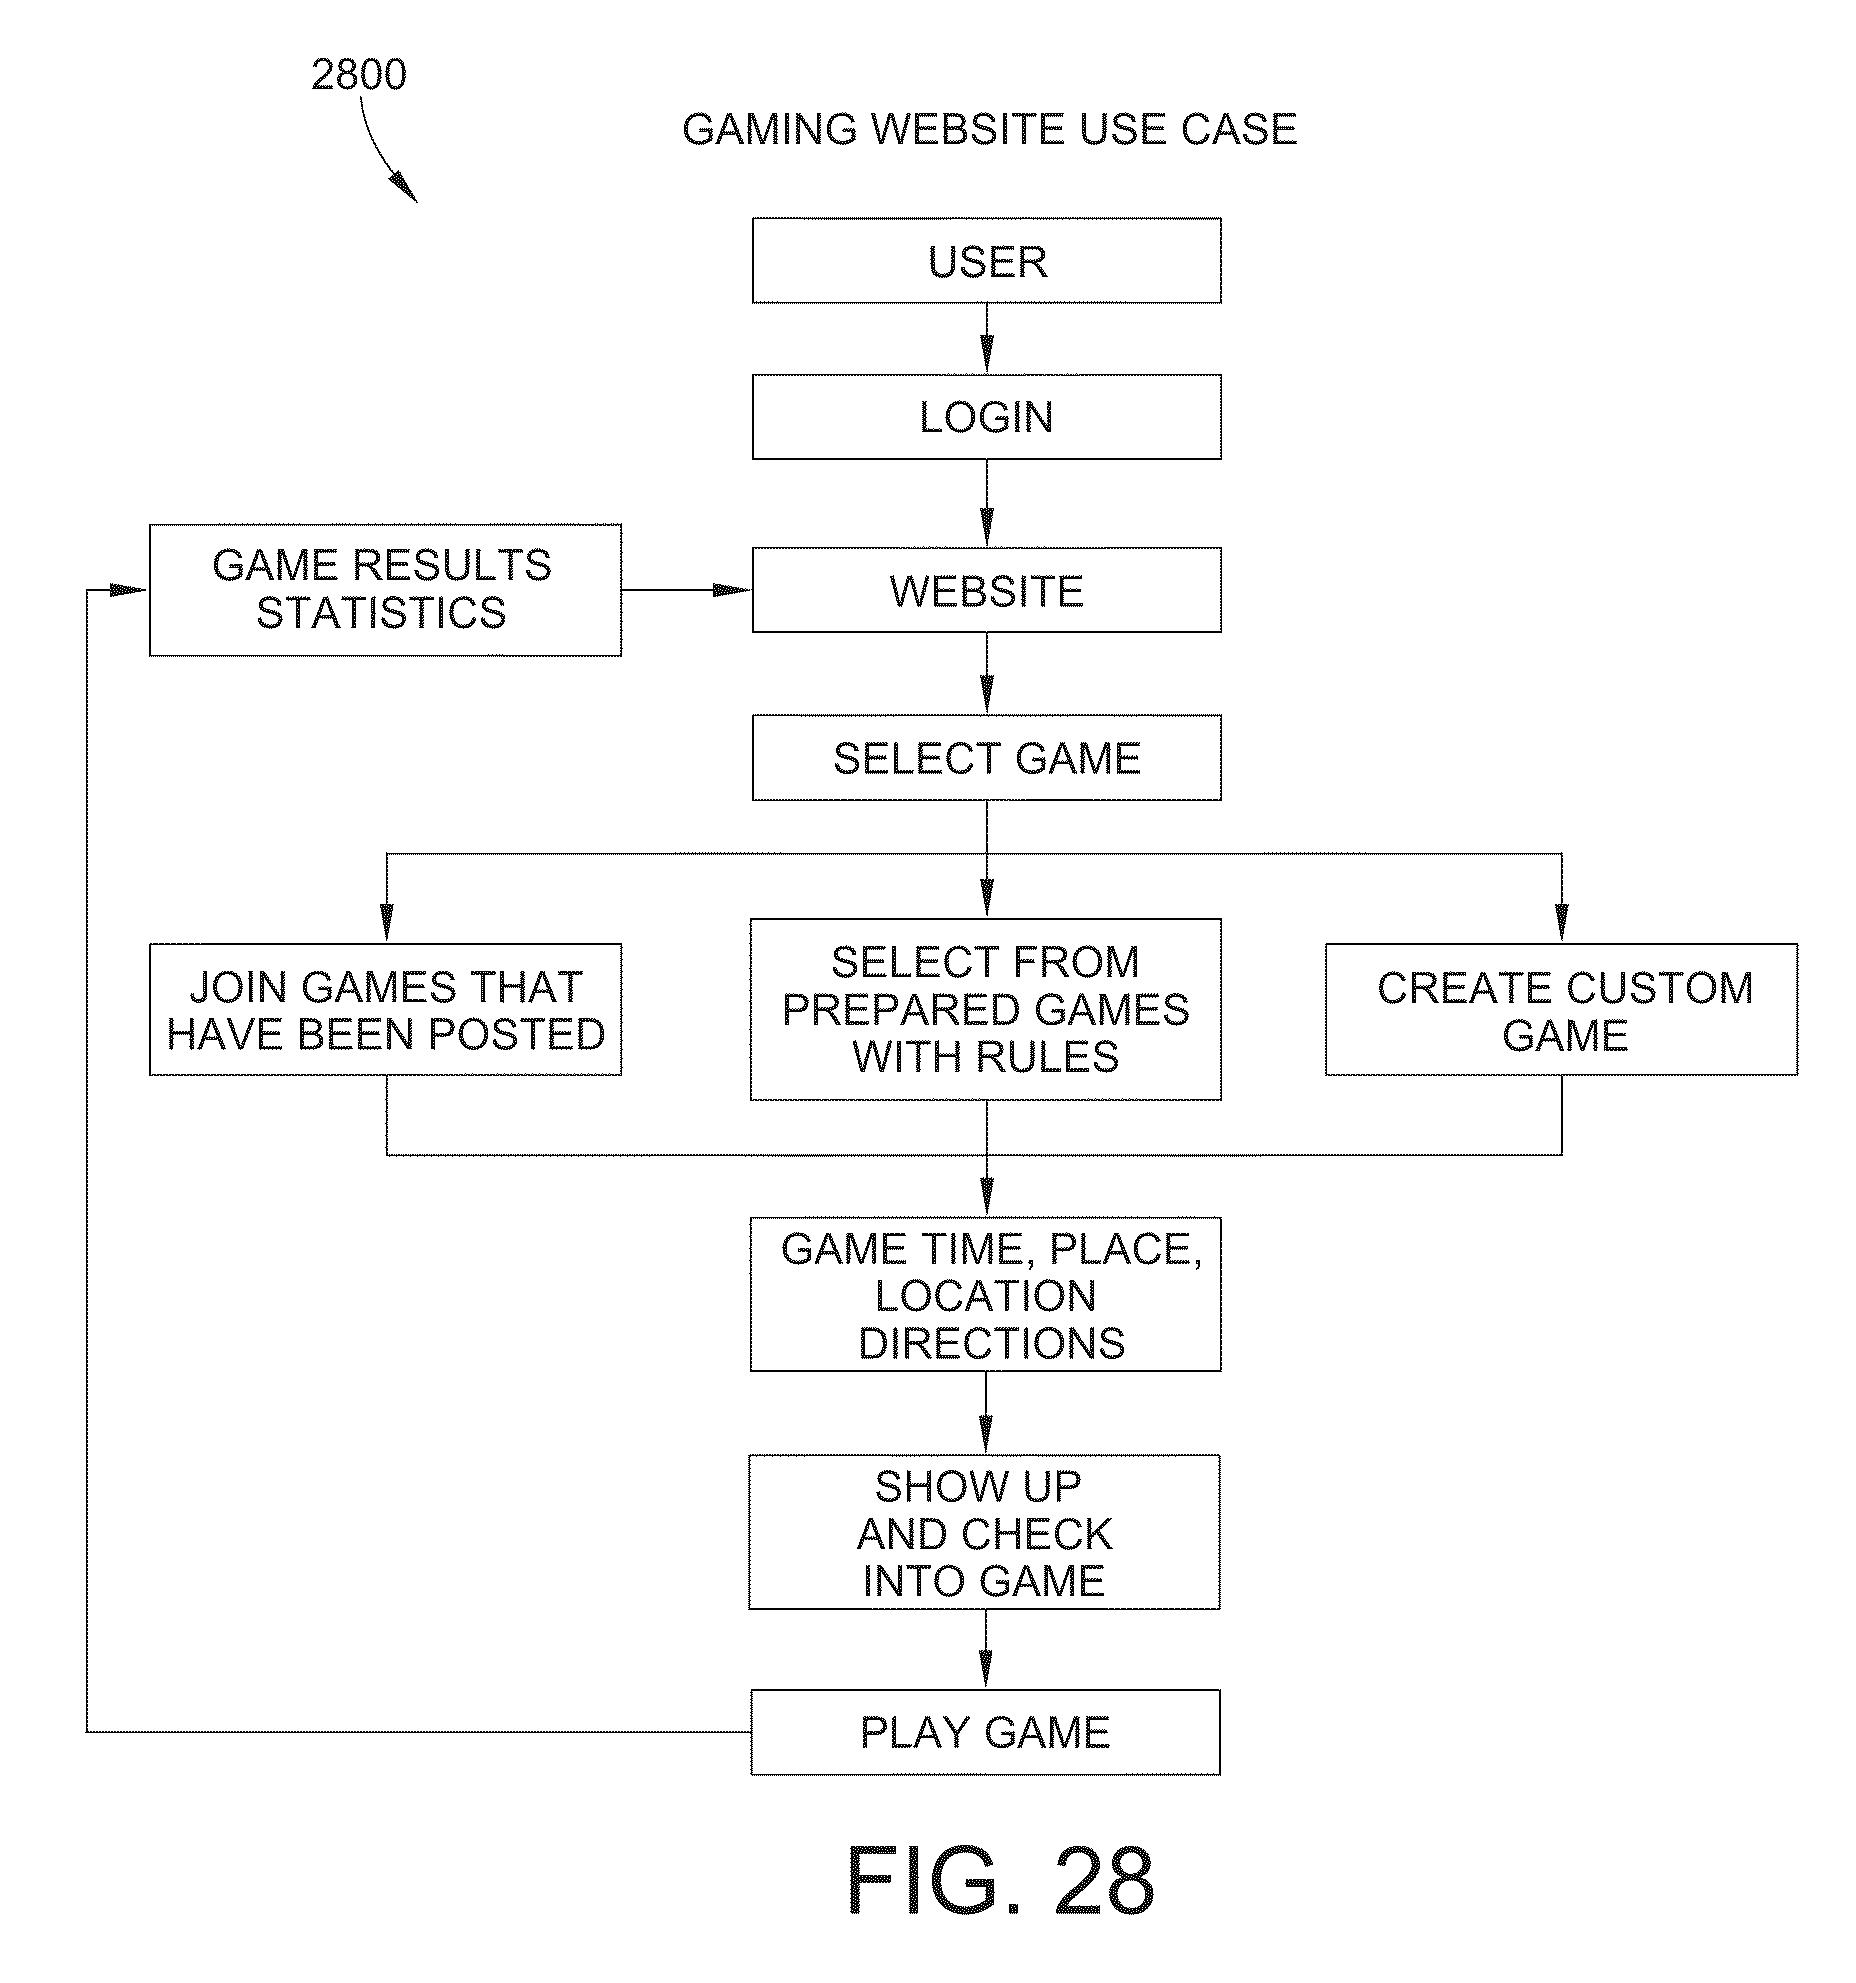 Patent US 9,329,689 B2